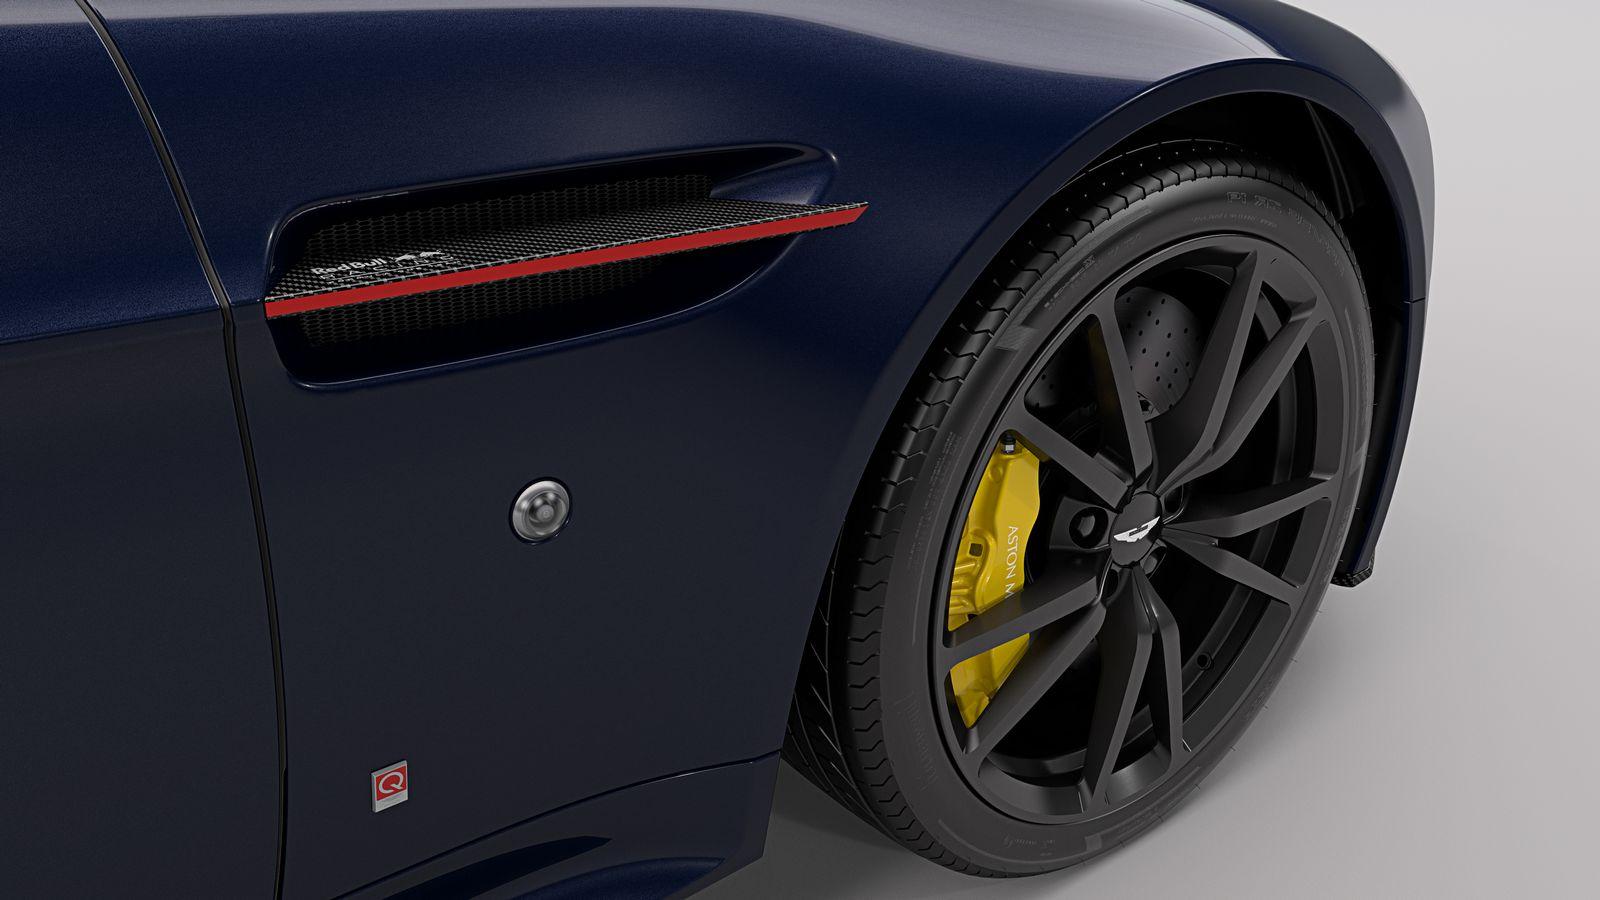 Aston Martin V8 and V12 Vantage Red Bull Racing Editions (12)